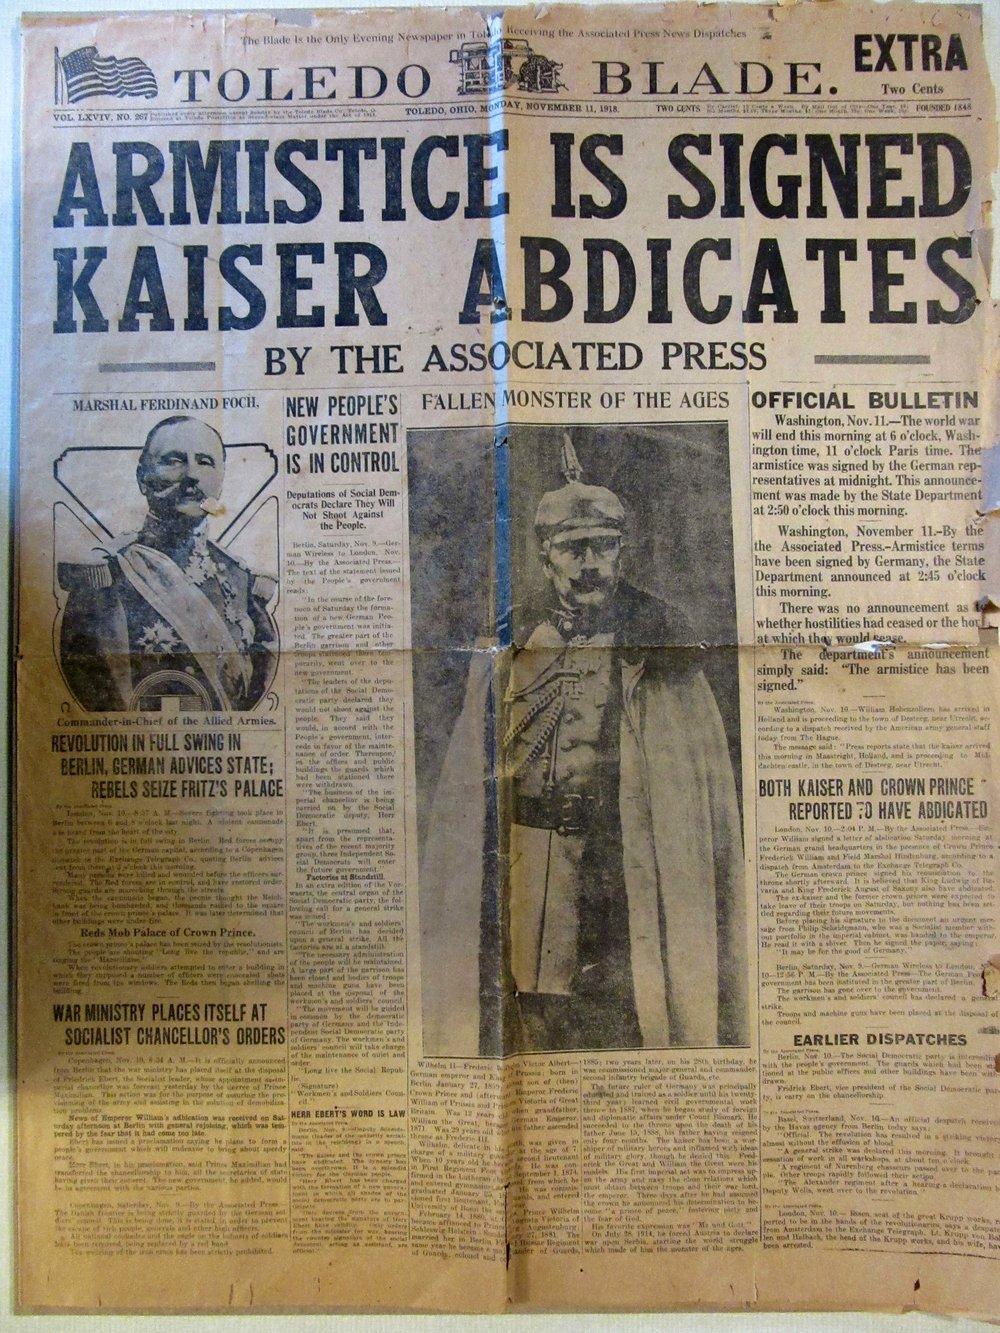 Toledo Blade Extra - November 11, 1918